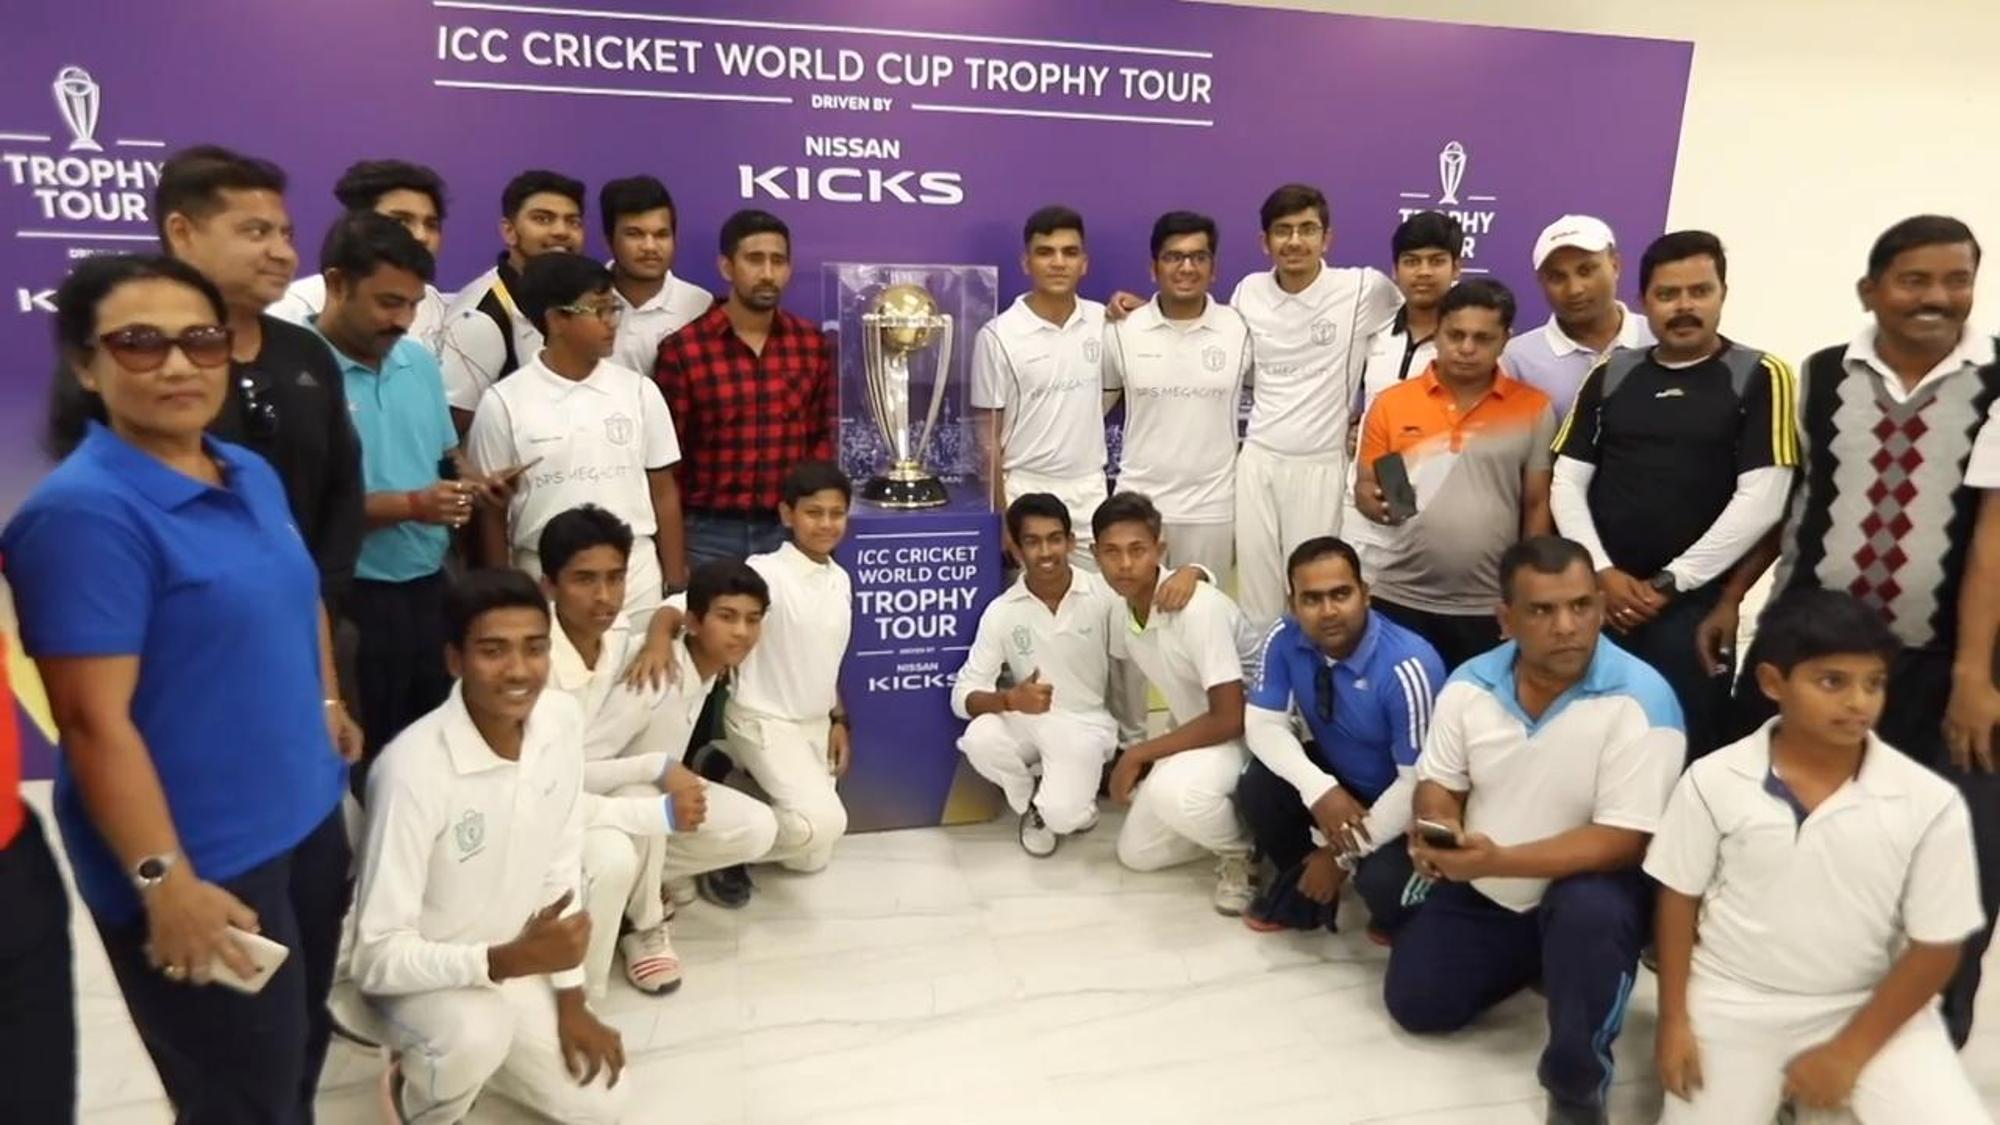 ICC #CWCTrophyTour driven by Nissan Kicks reaches the City of Joy, Kolkata